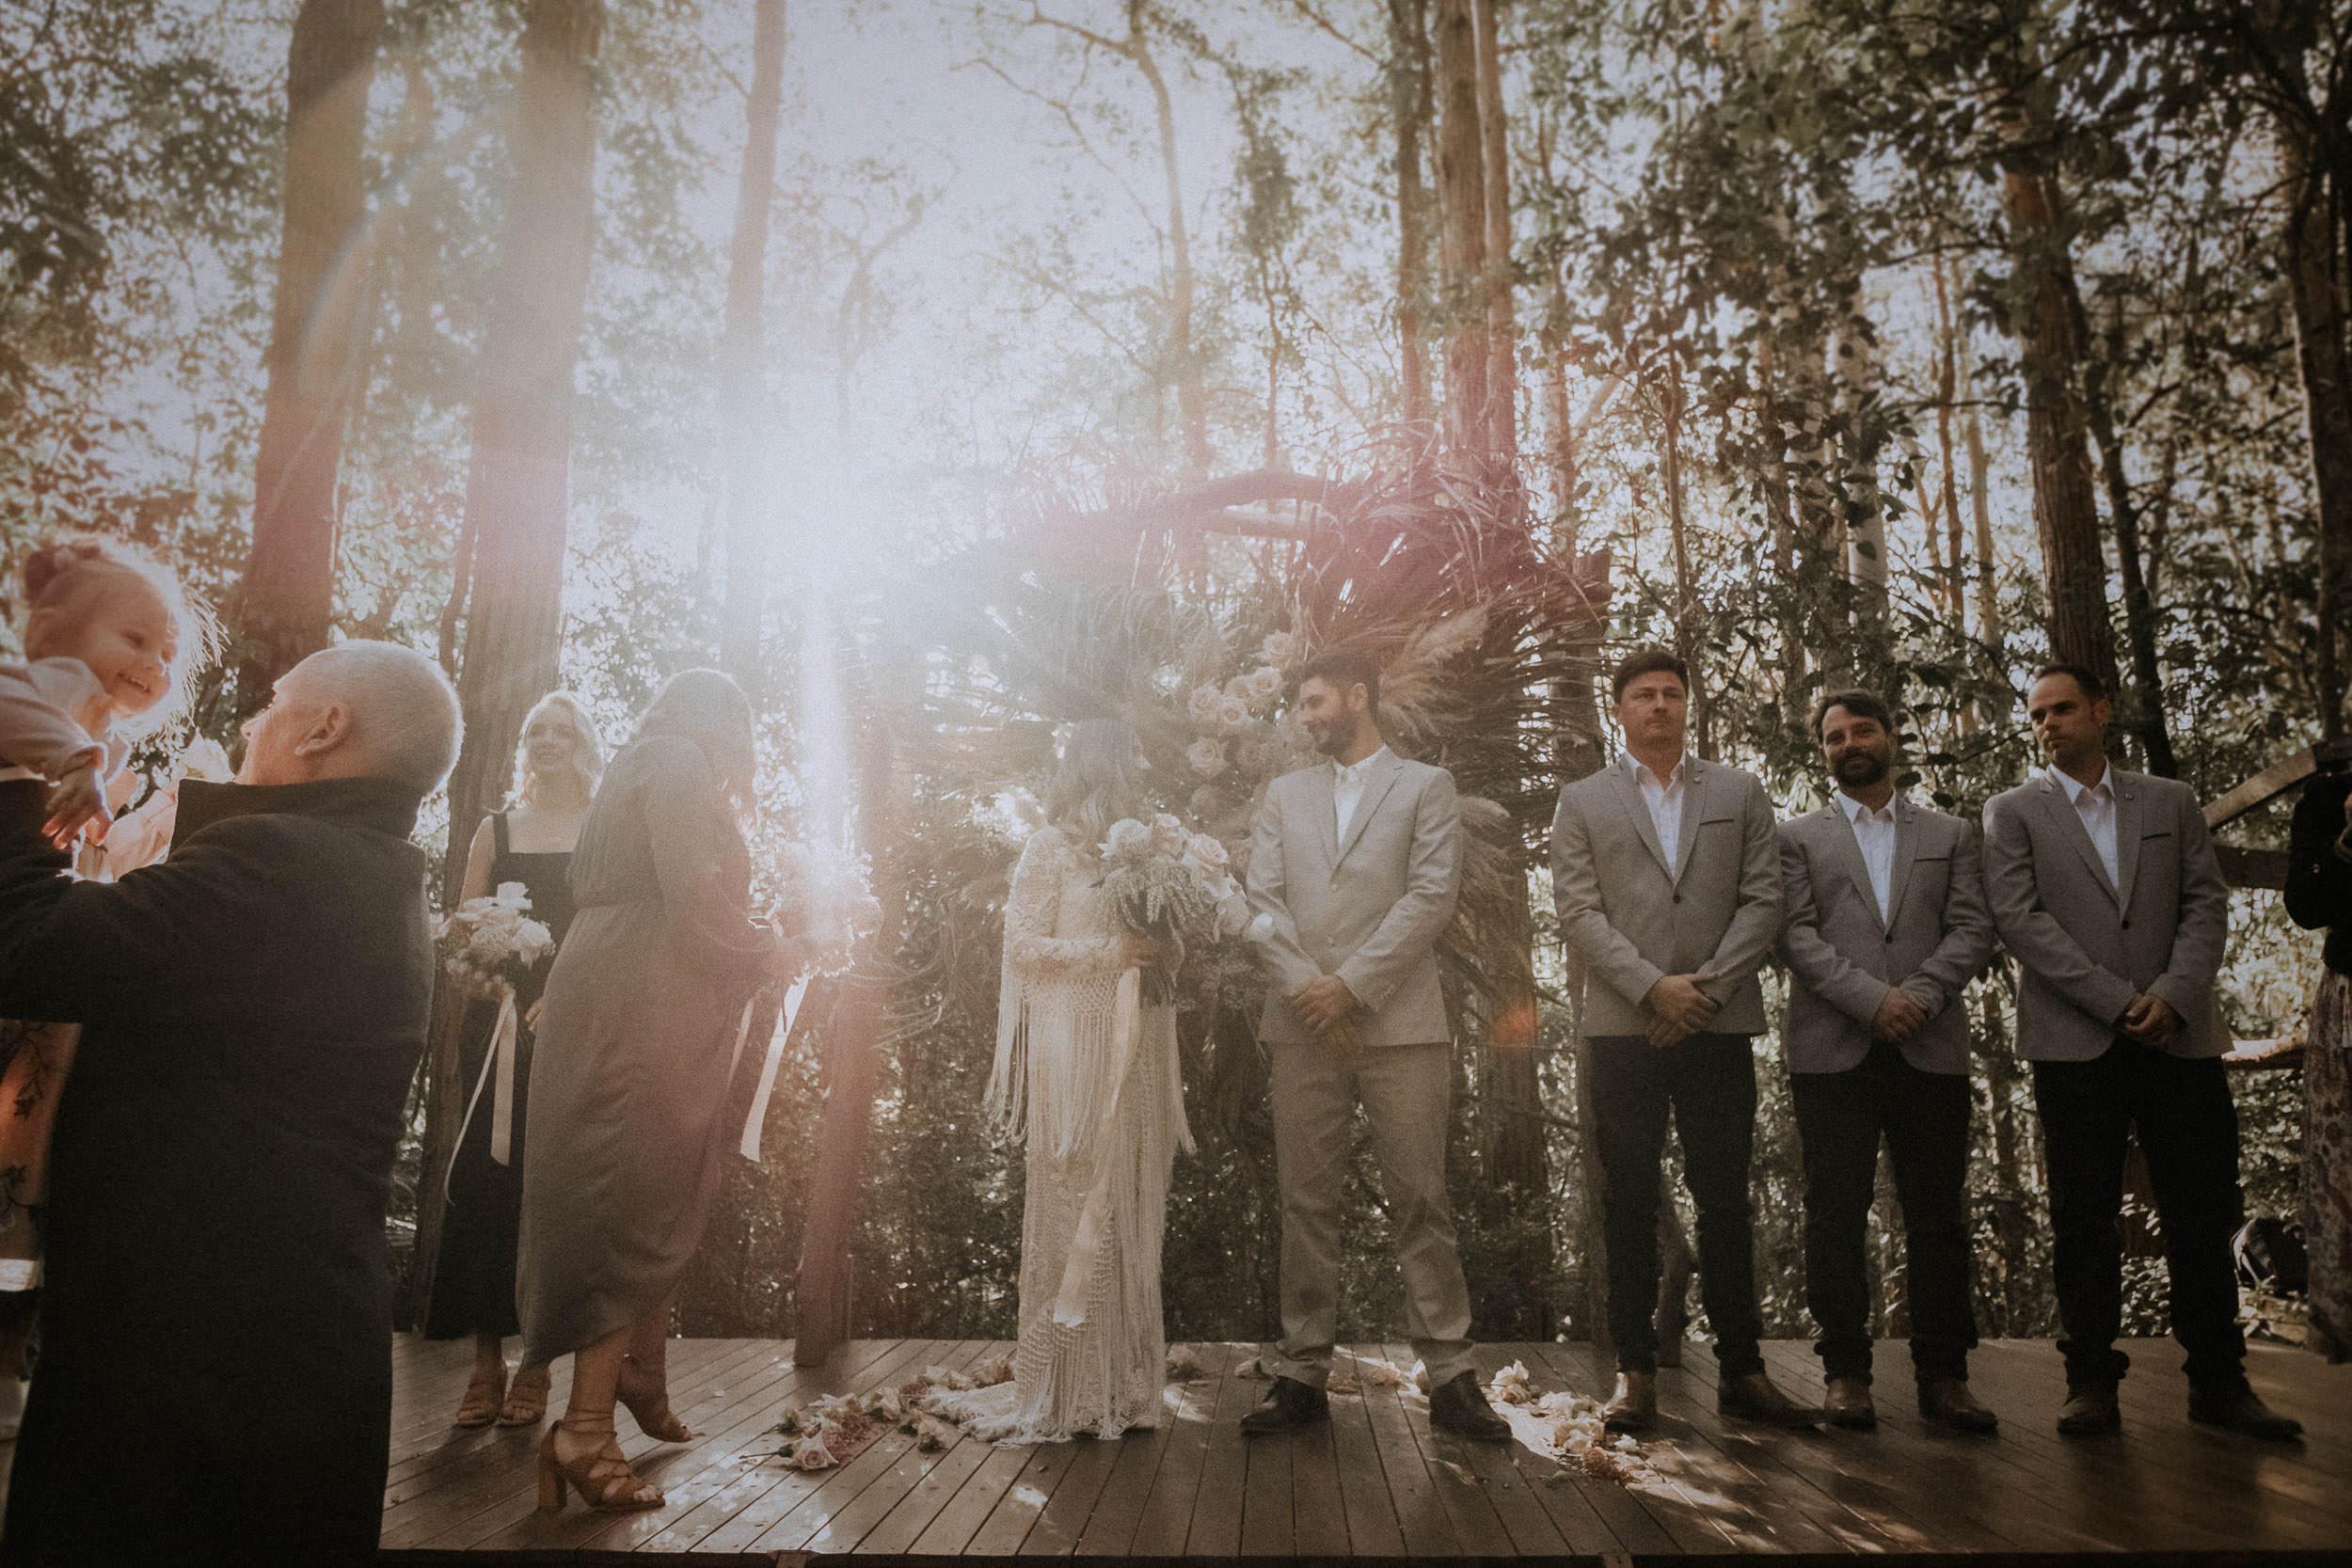 S&A Elopement - Kings & Thieves - Shred 'Til Dead - Central Coast Beach Forest Wedding - 176.jpg